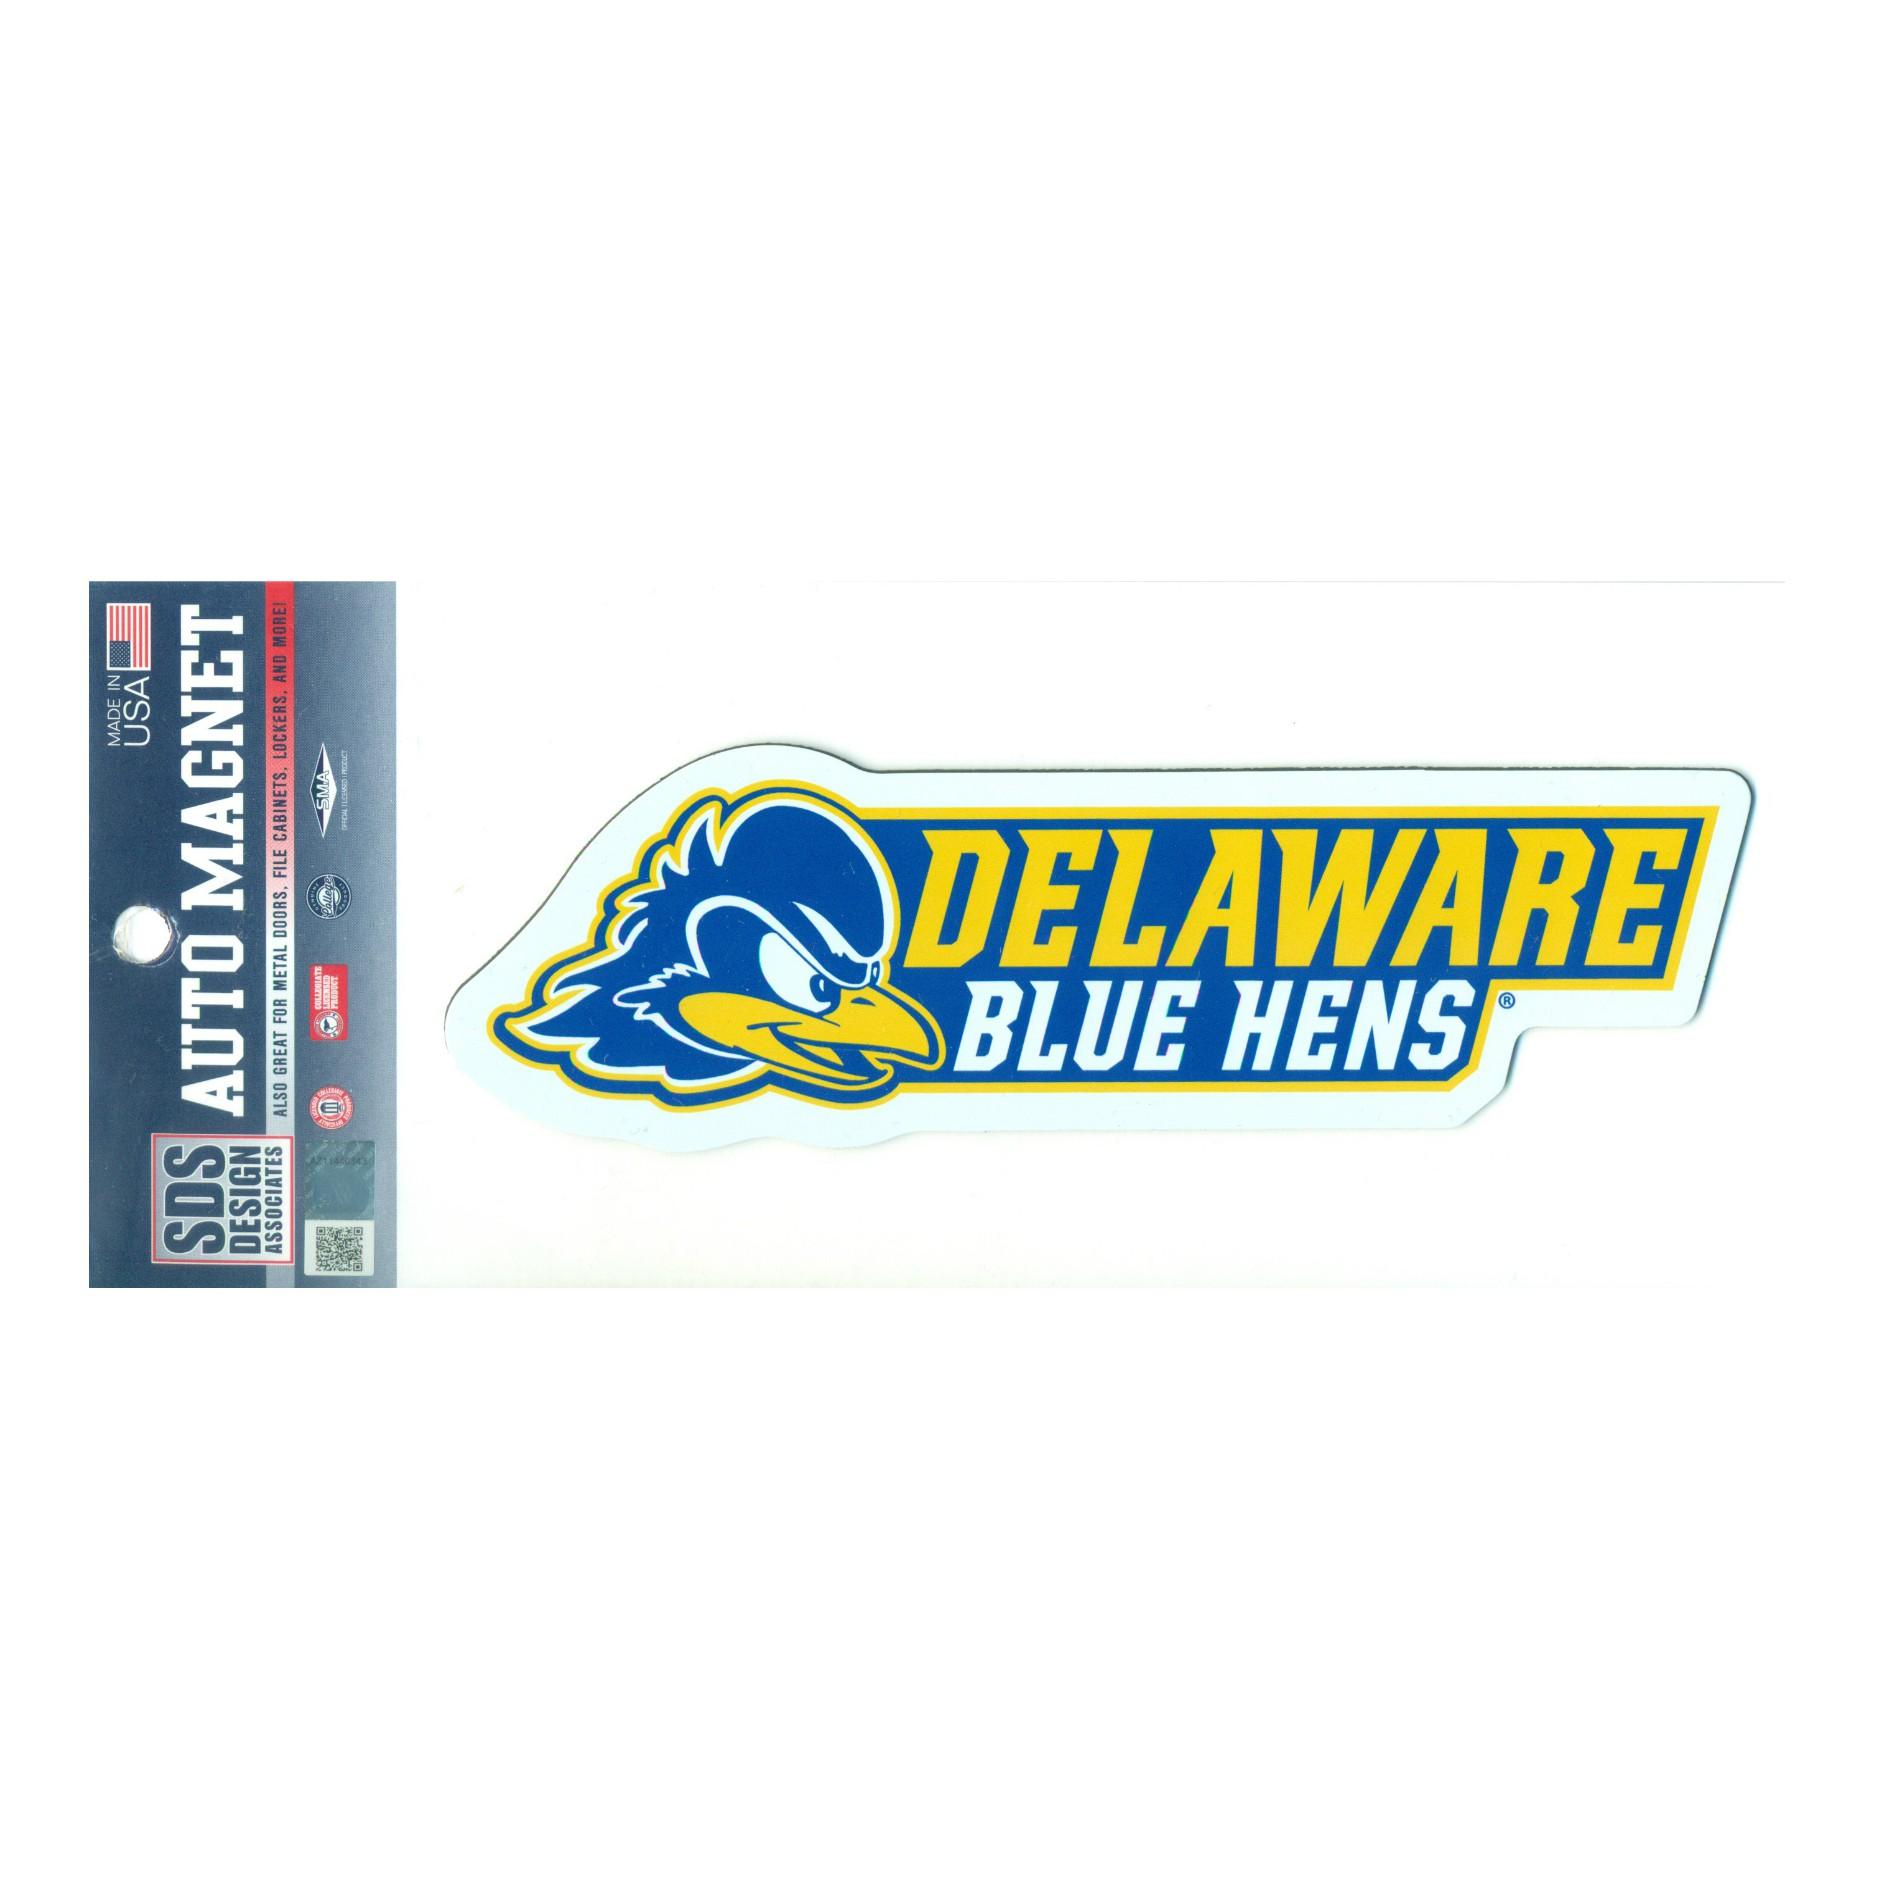 Wincraft Delaware Blue Hens Die Cut Decal 4 x 4